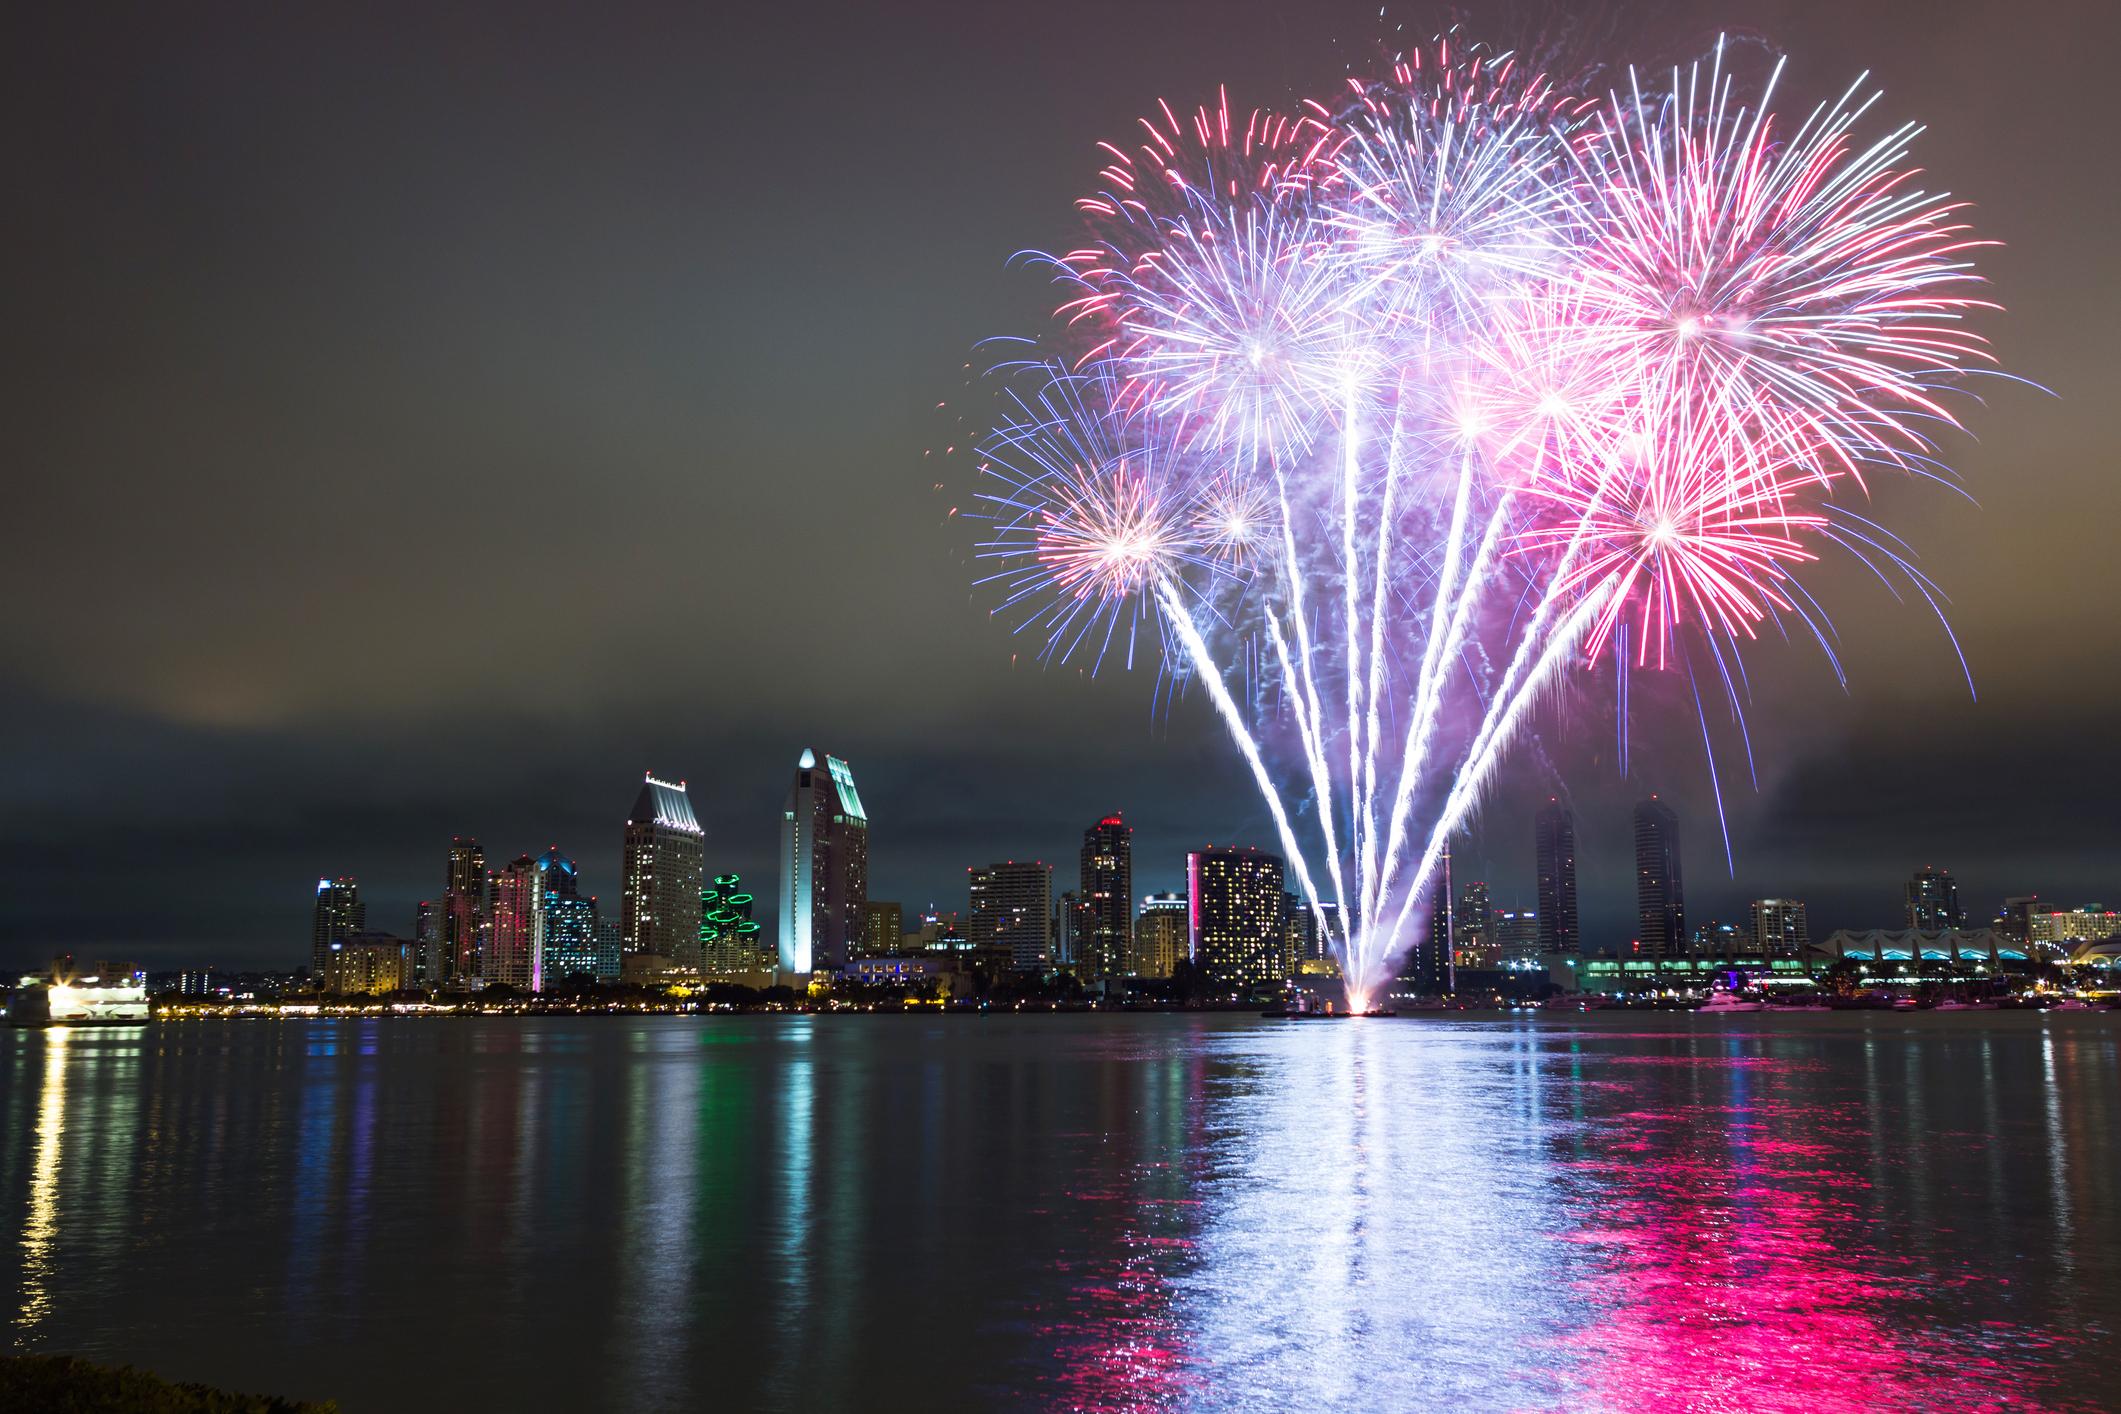 San Diego 4th of July fireworks over skyline.